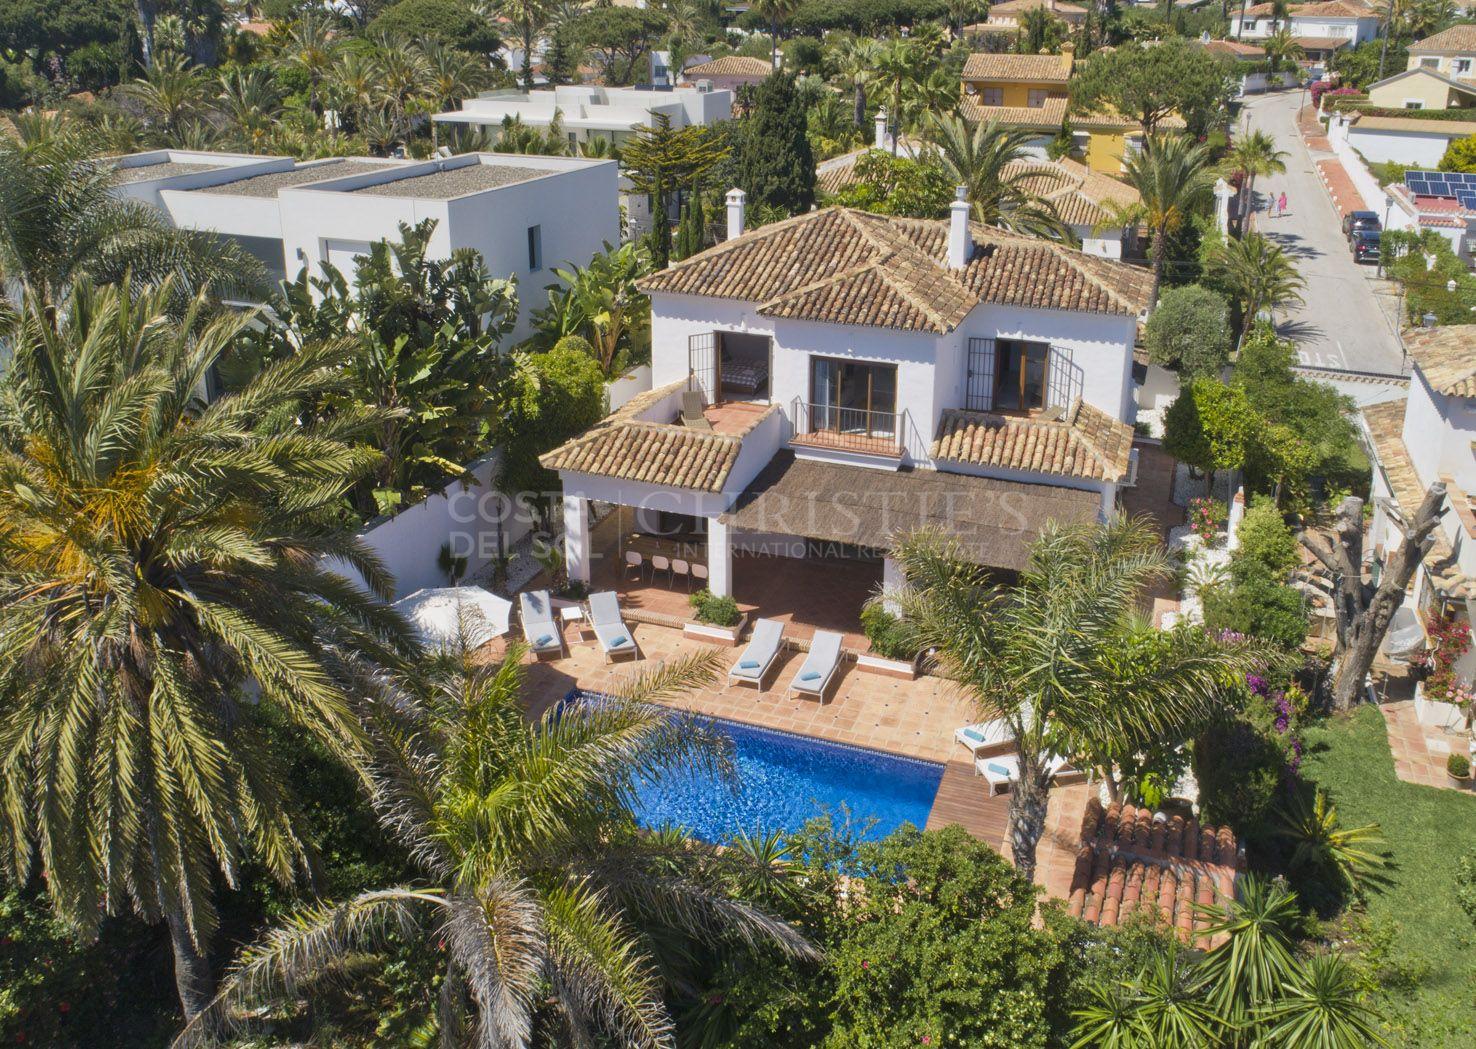 Stunning Villa Escondite, Marbesa, Marbella | Christie's International Real Estate